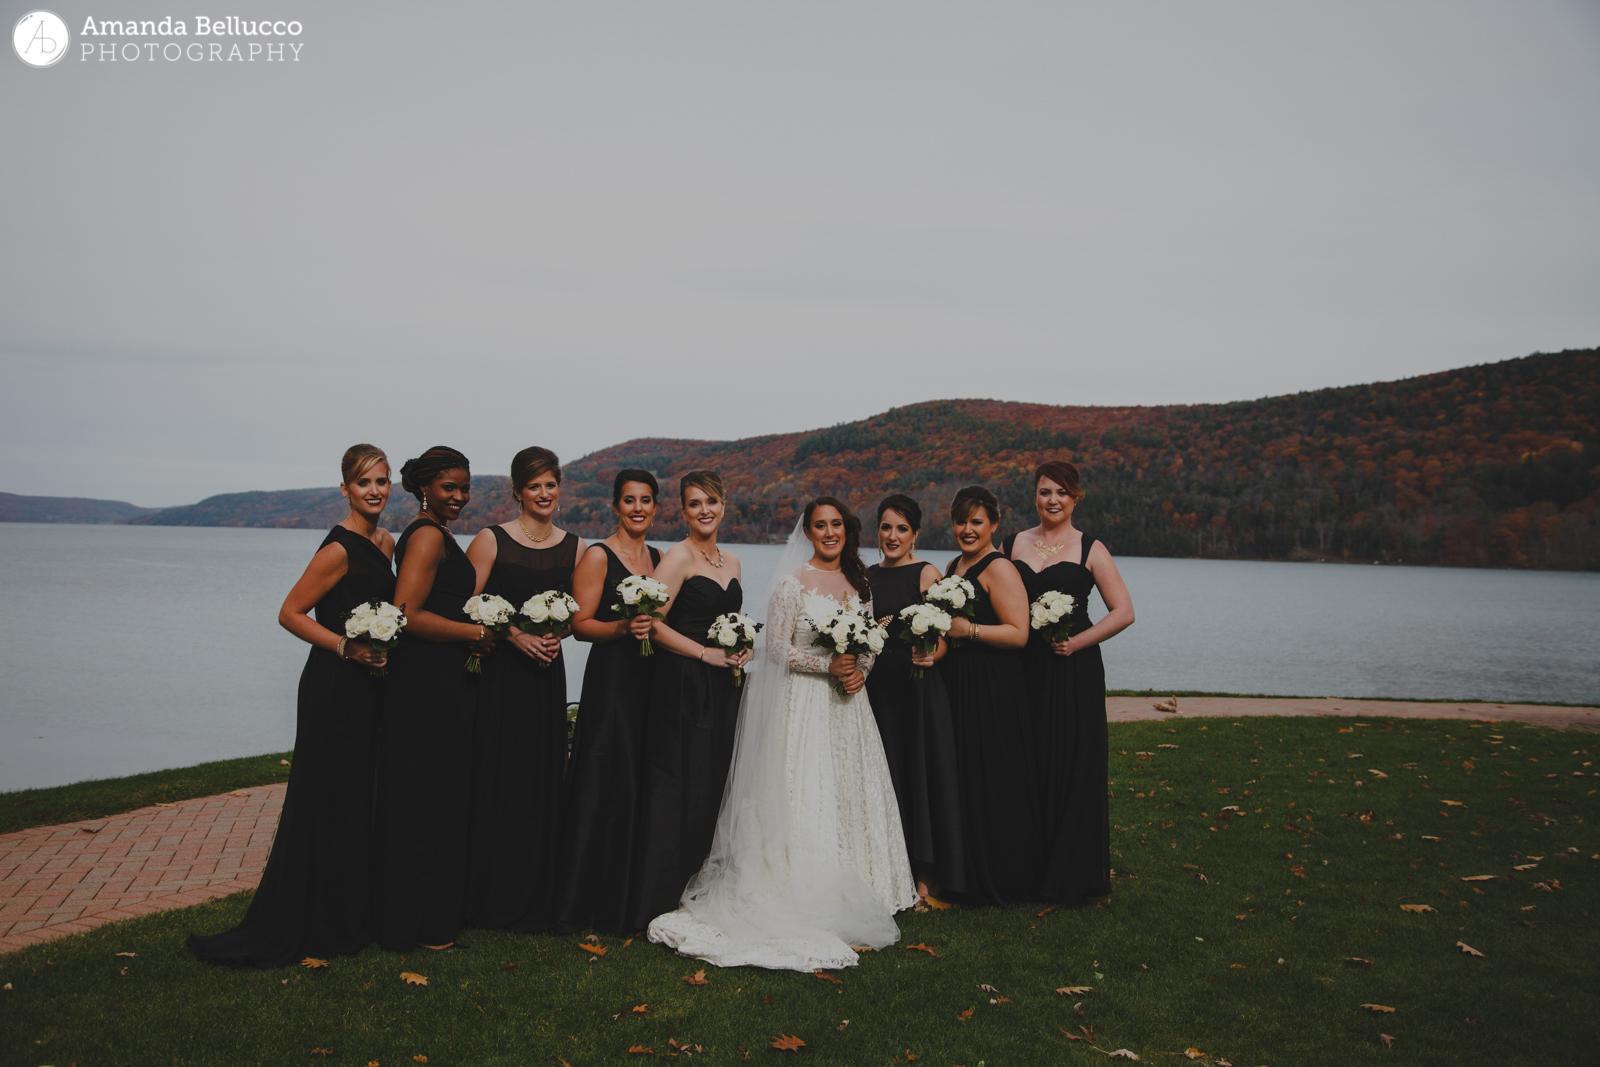 syracuse-rochester-fine-art-wedding-photographer-67.JPG